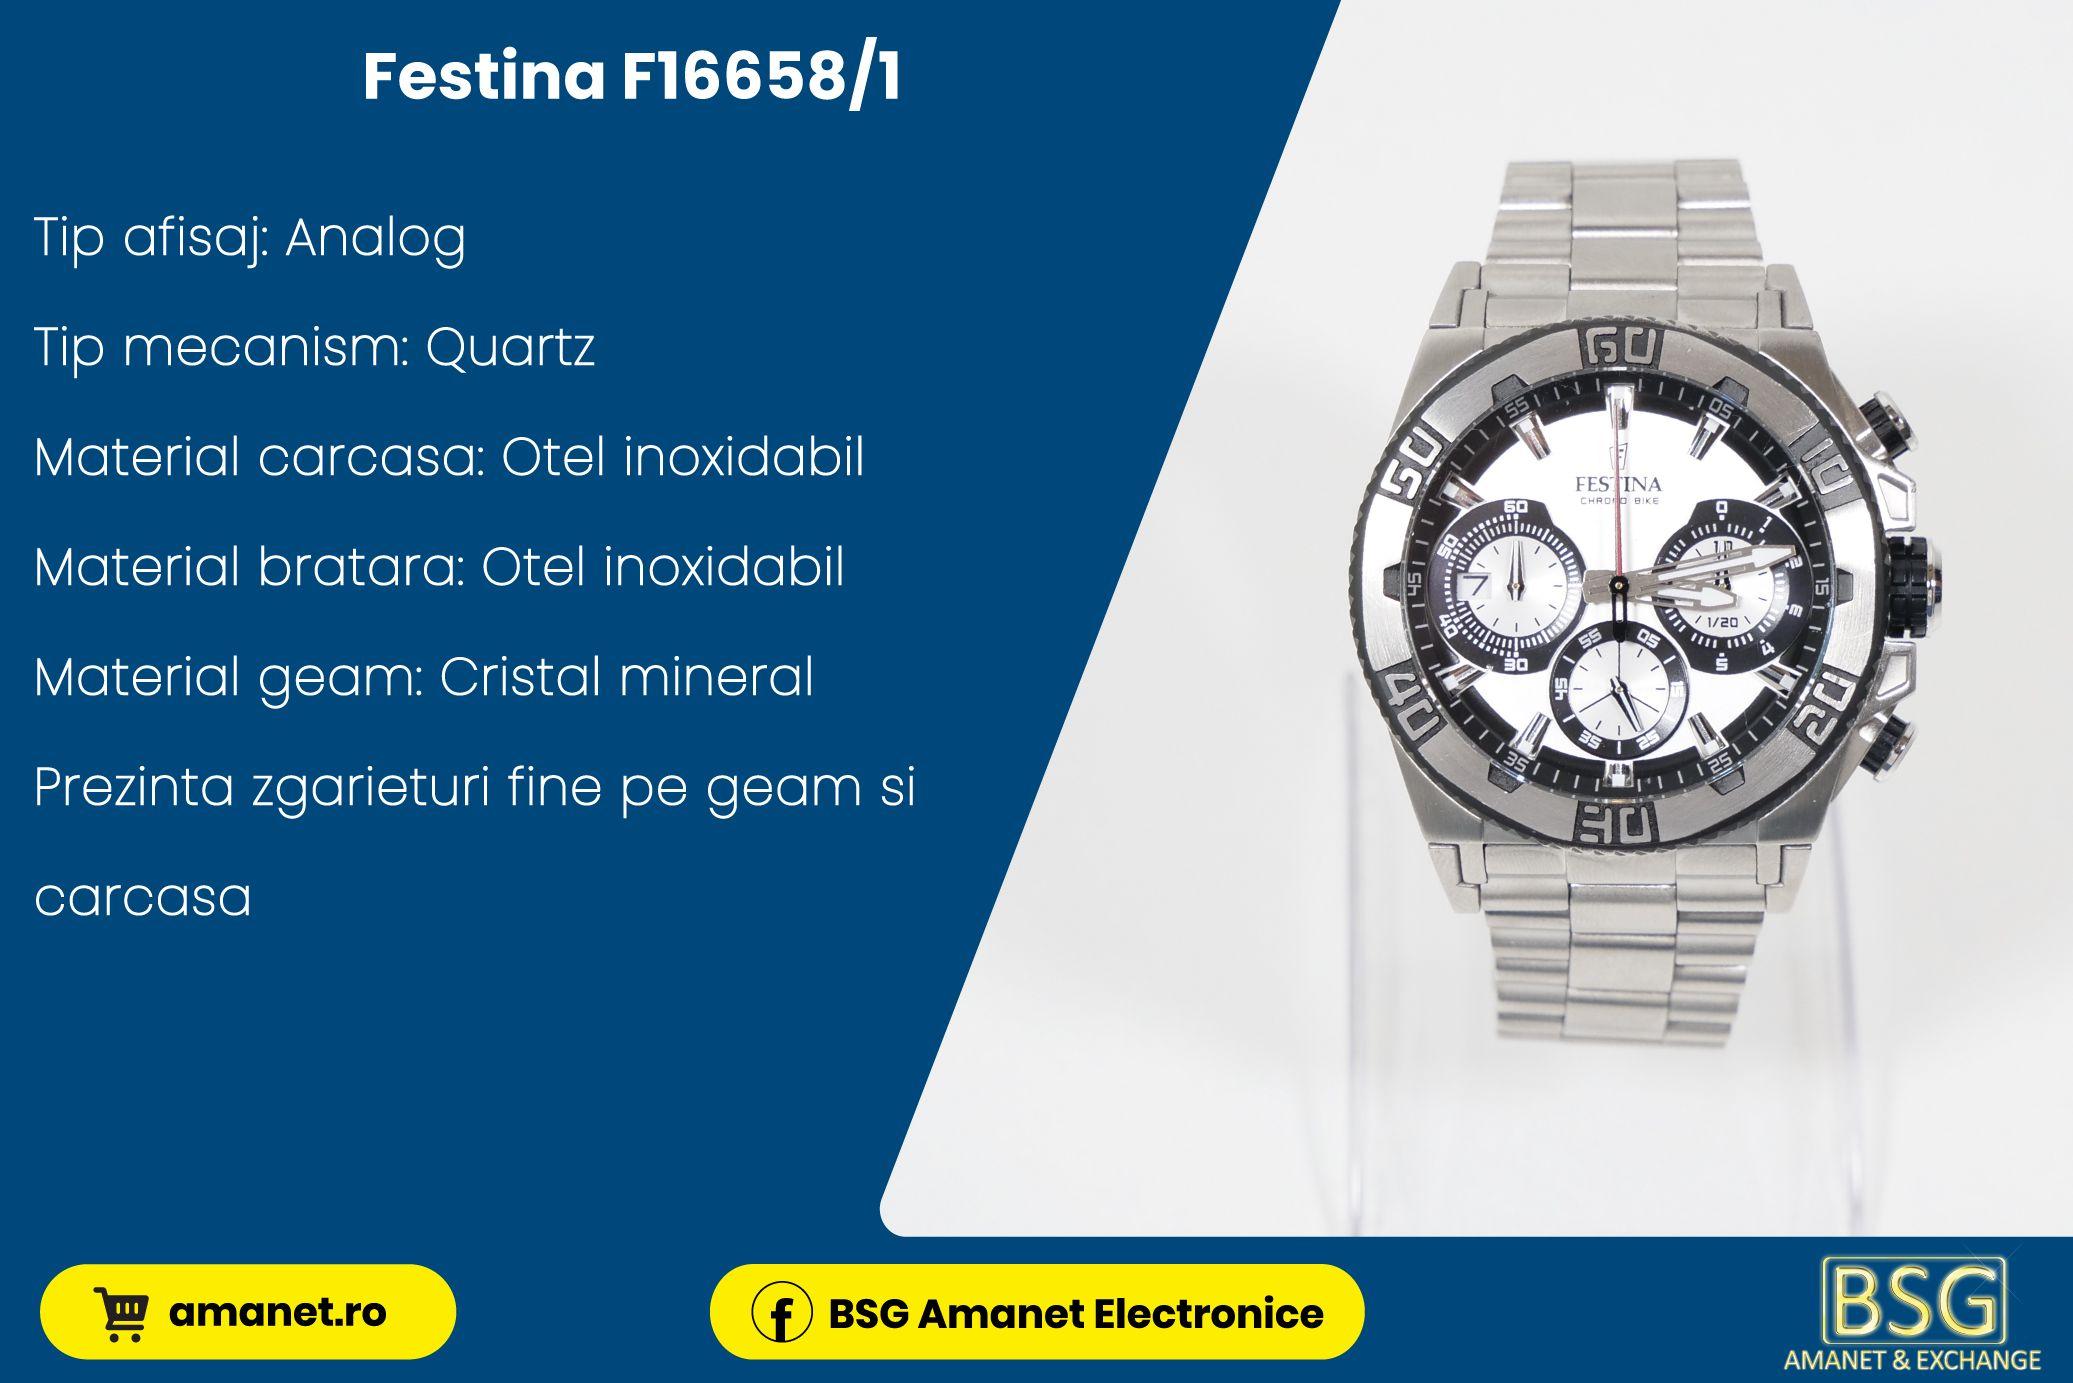 Ceas Festina F16658/1 - BSG Amanet & Exchange